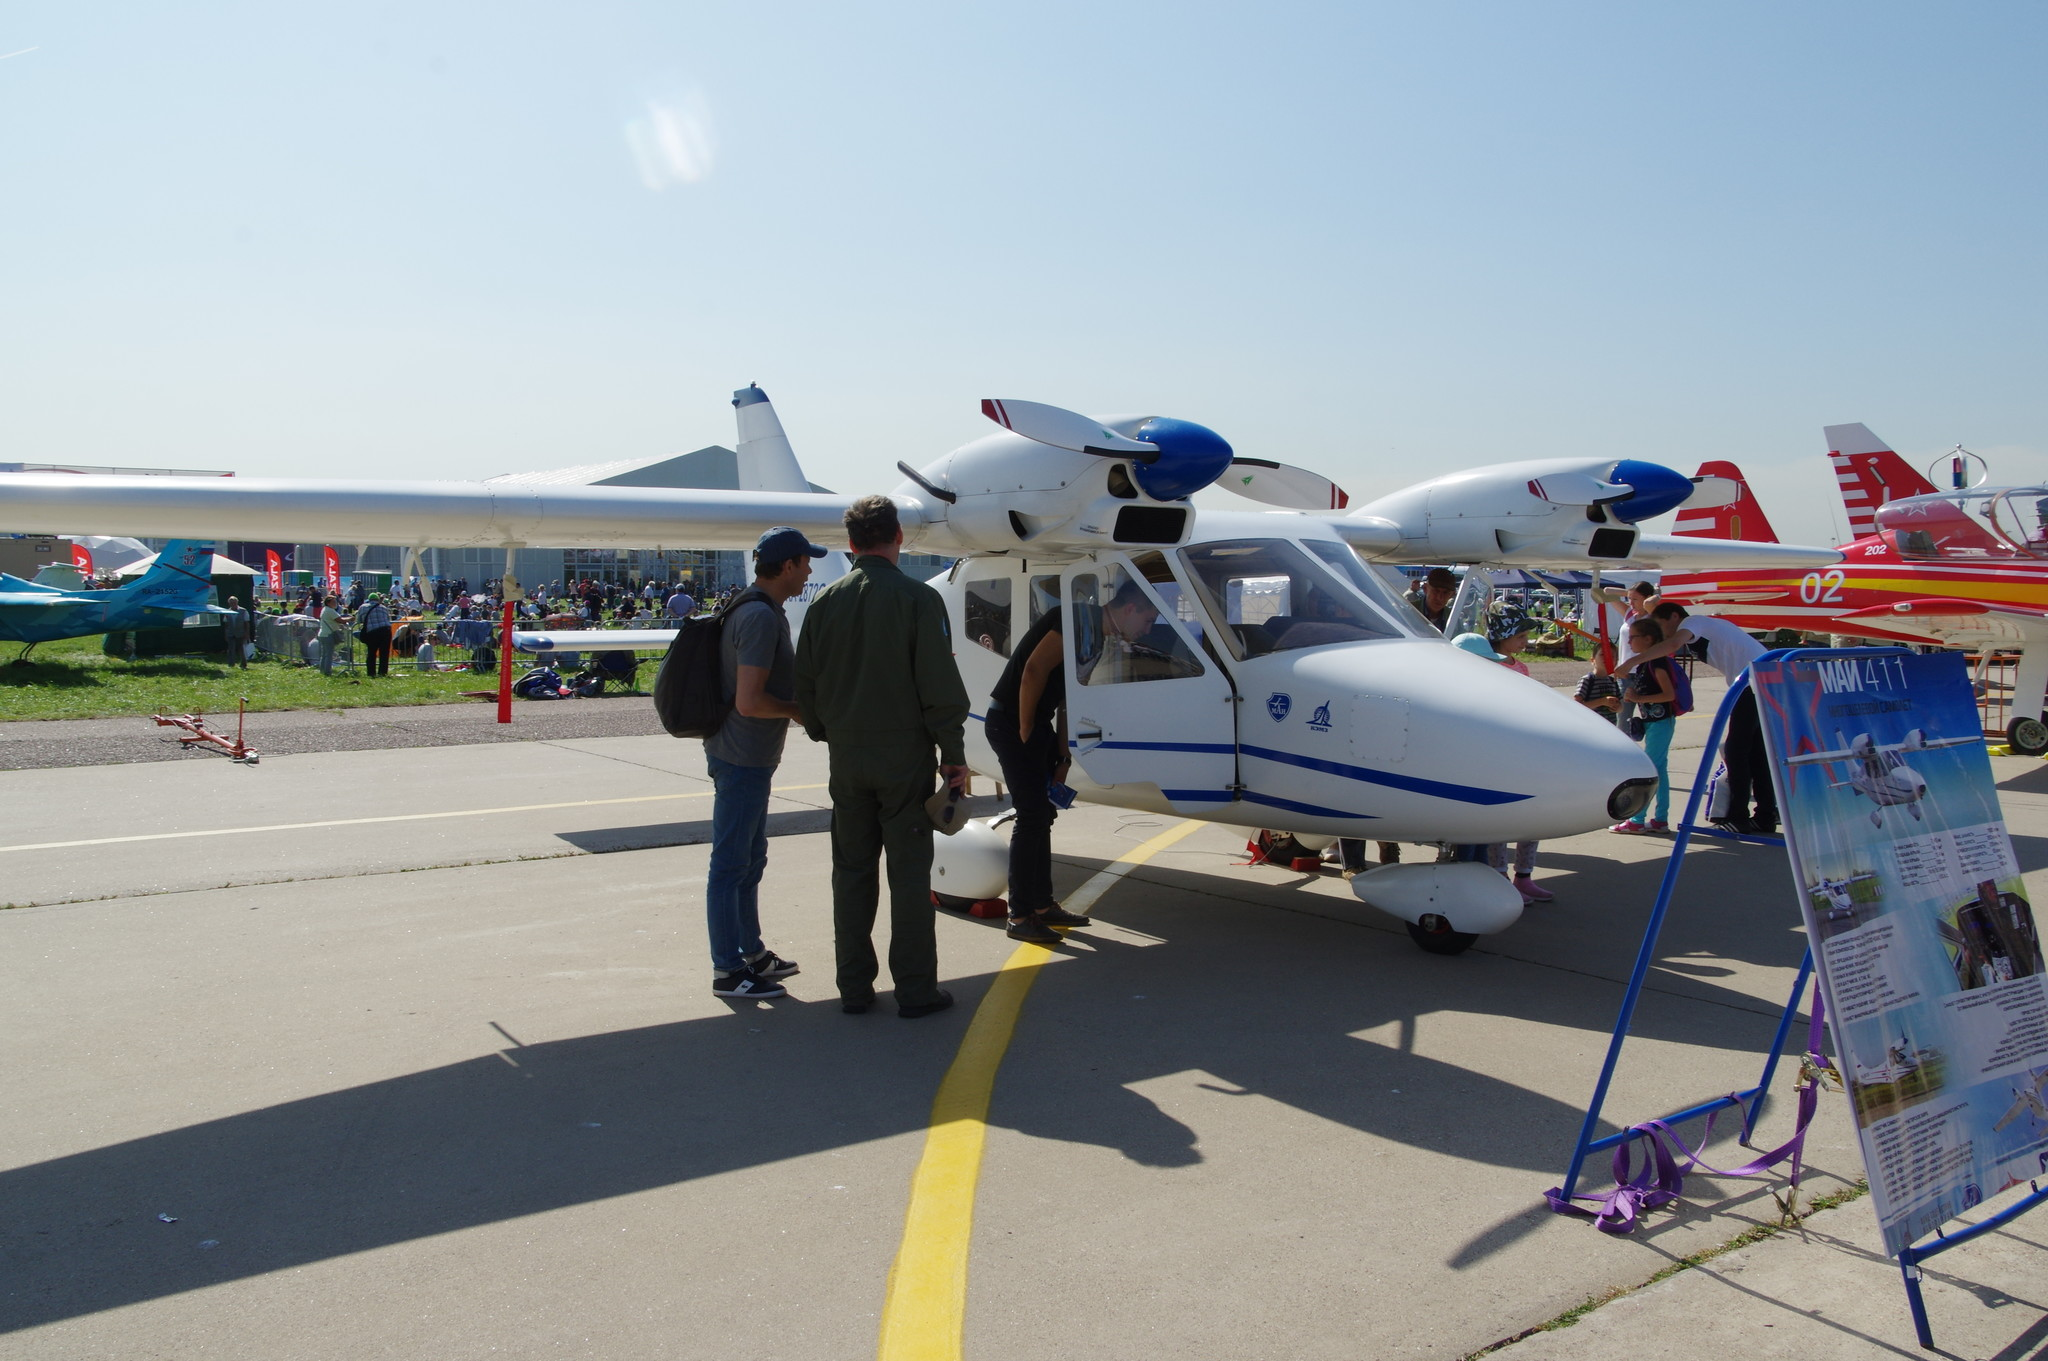 Лёгкий четырёхместный самолёт МАИ-411